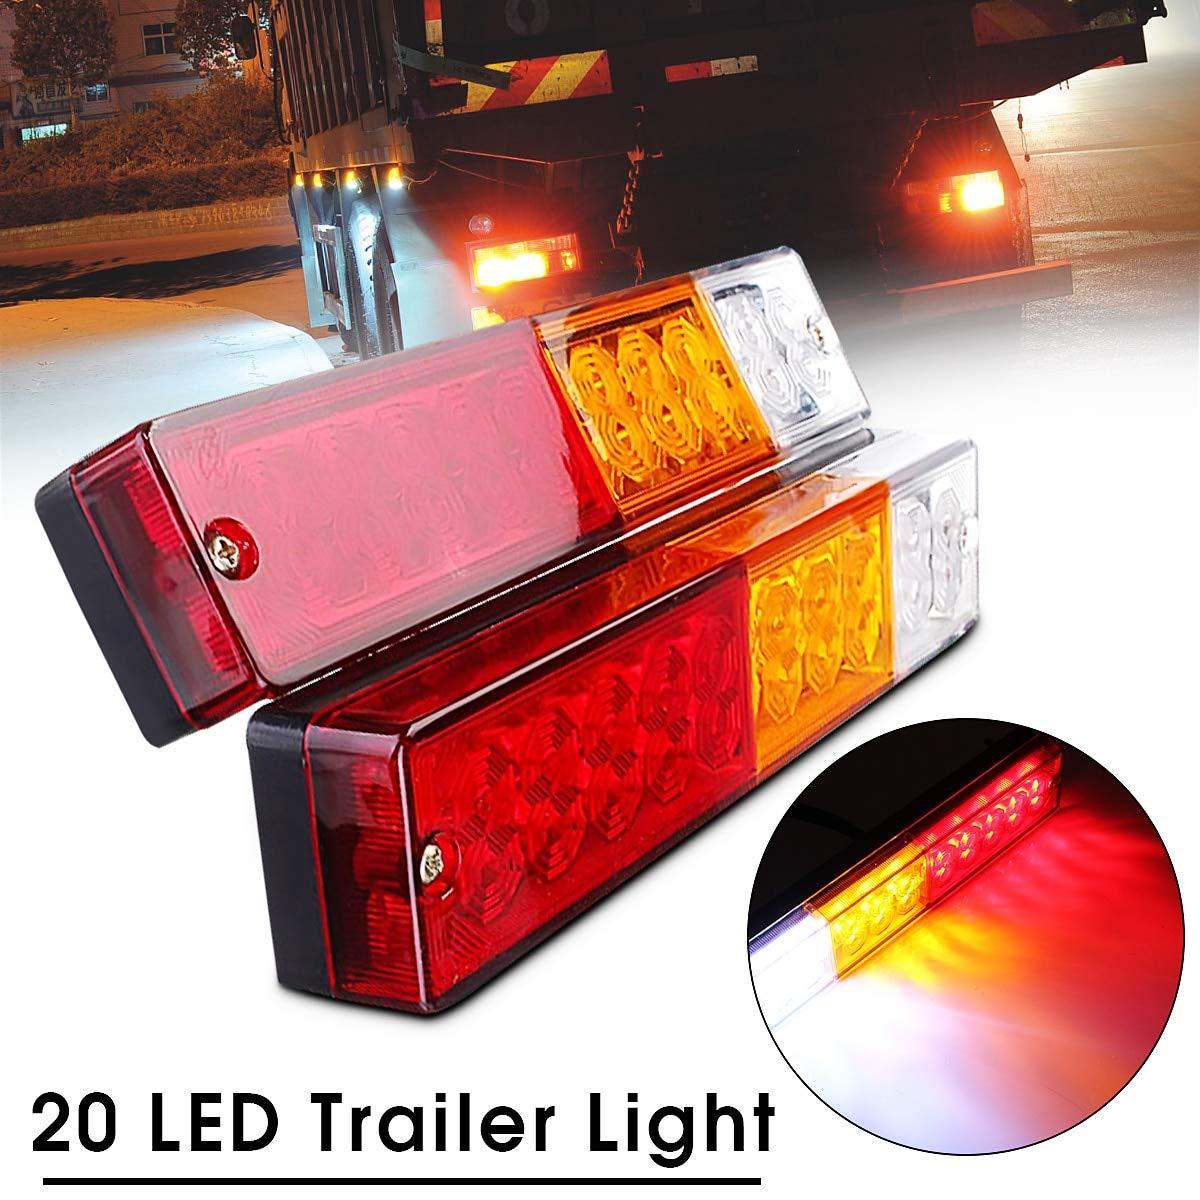 2pcs 12V 20LED Trailer Light Waterproof High Brightness Rear  Lamp Turning Signal Indicator Light LED Brake Lights For Car Truck|Truck Light System| |  - title=